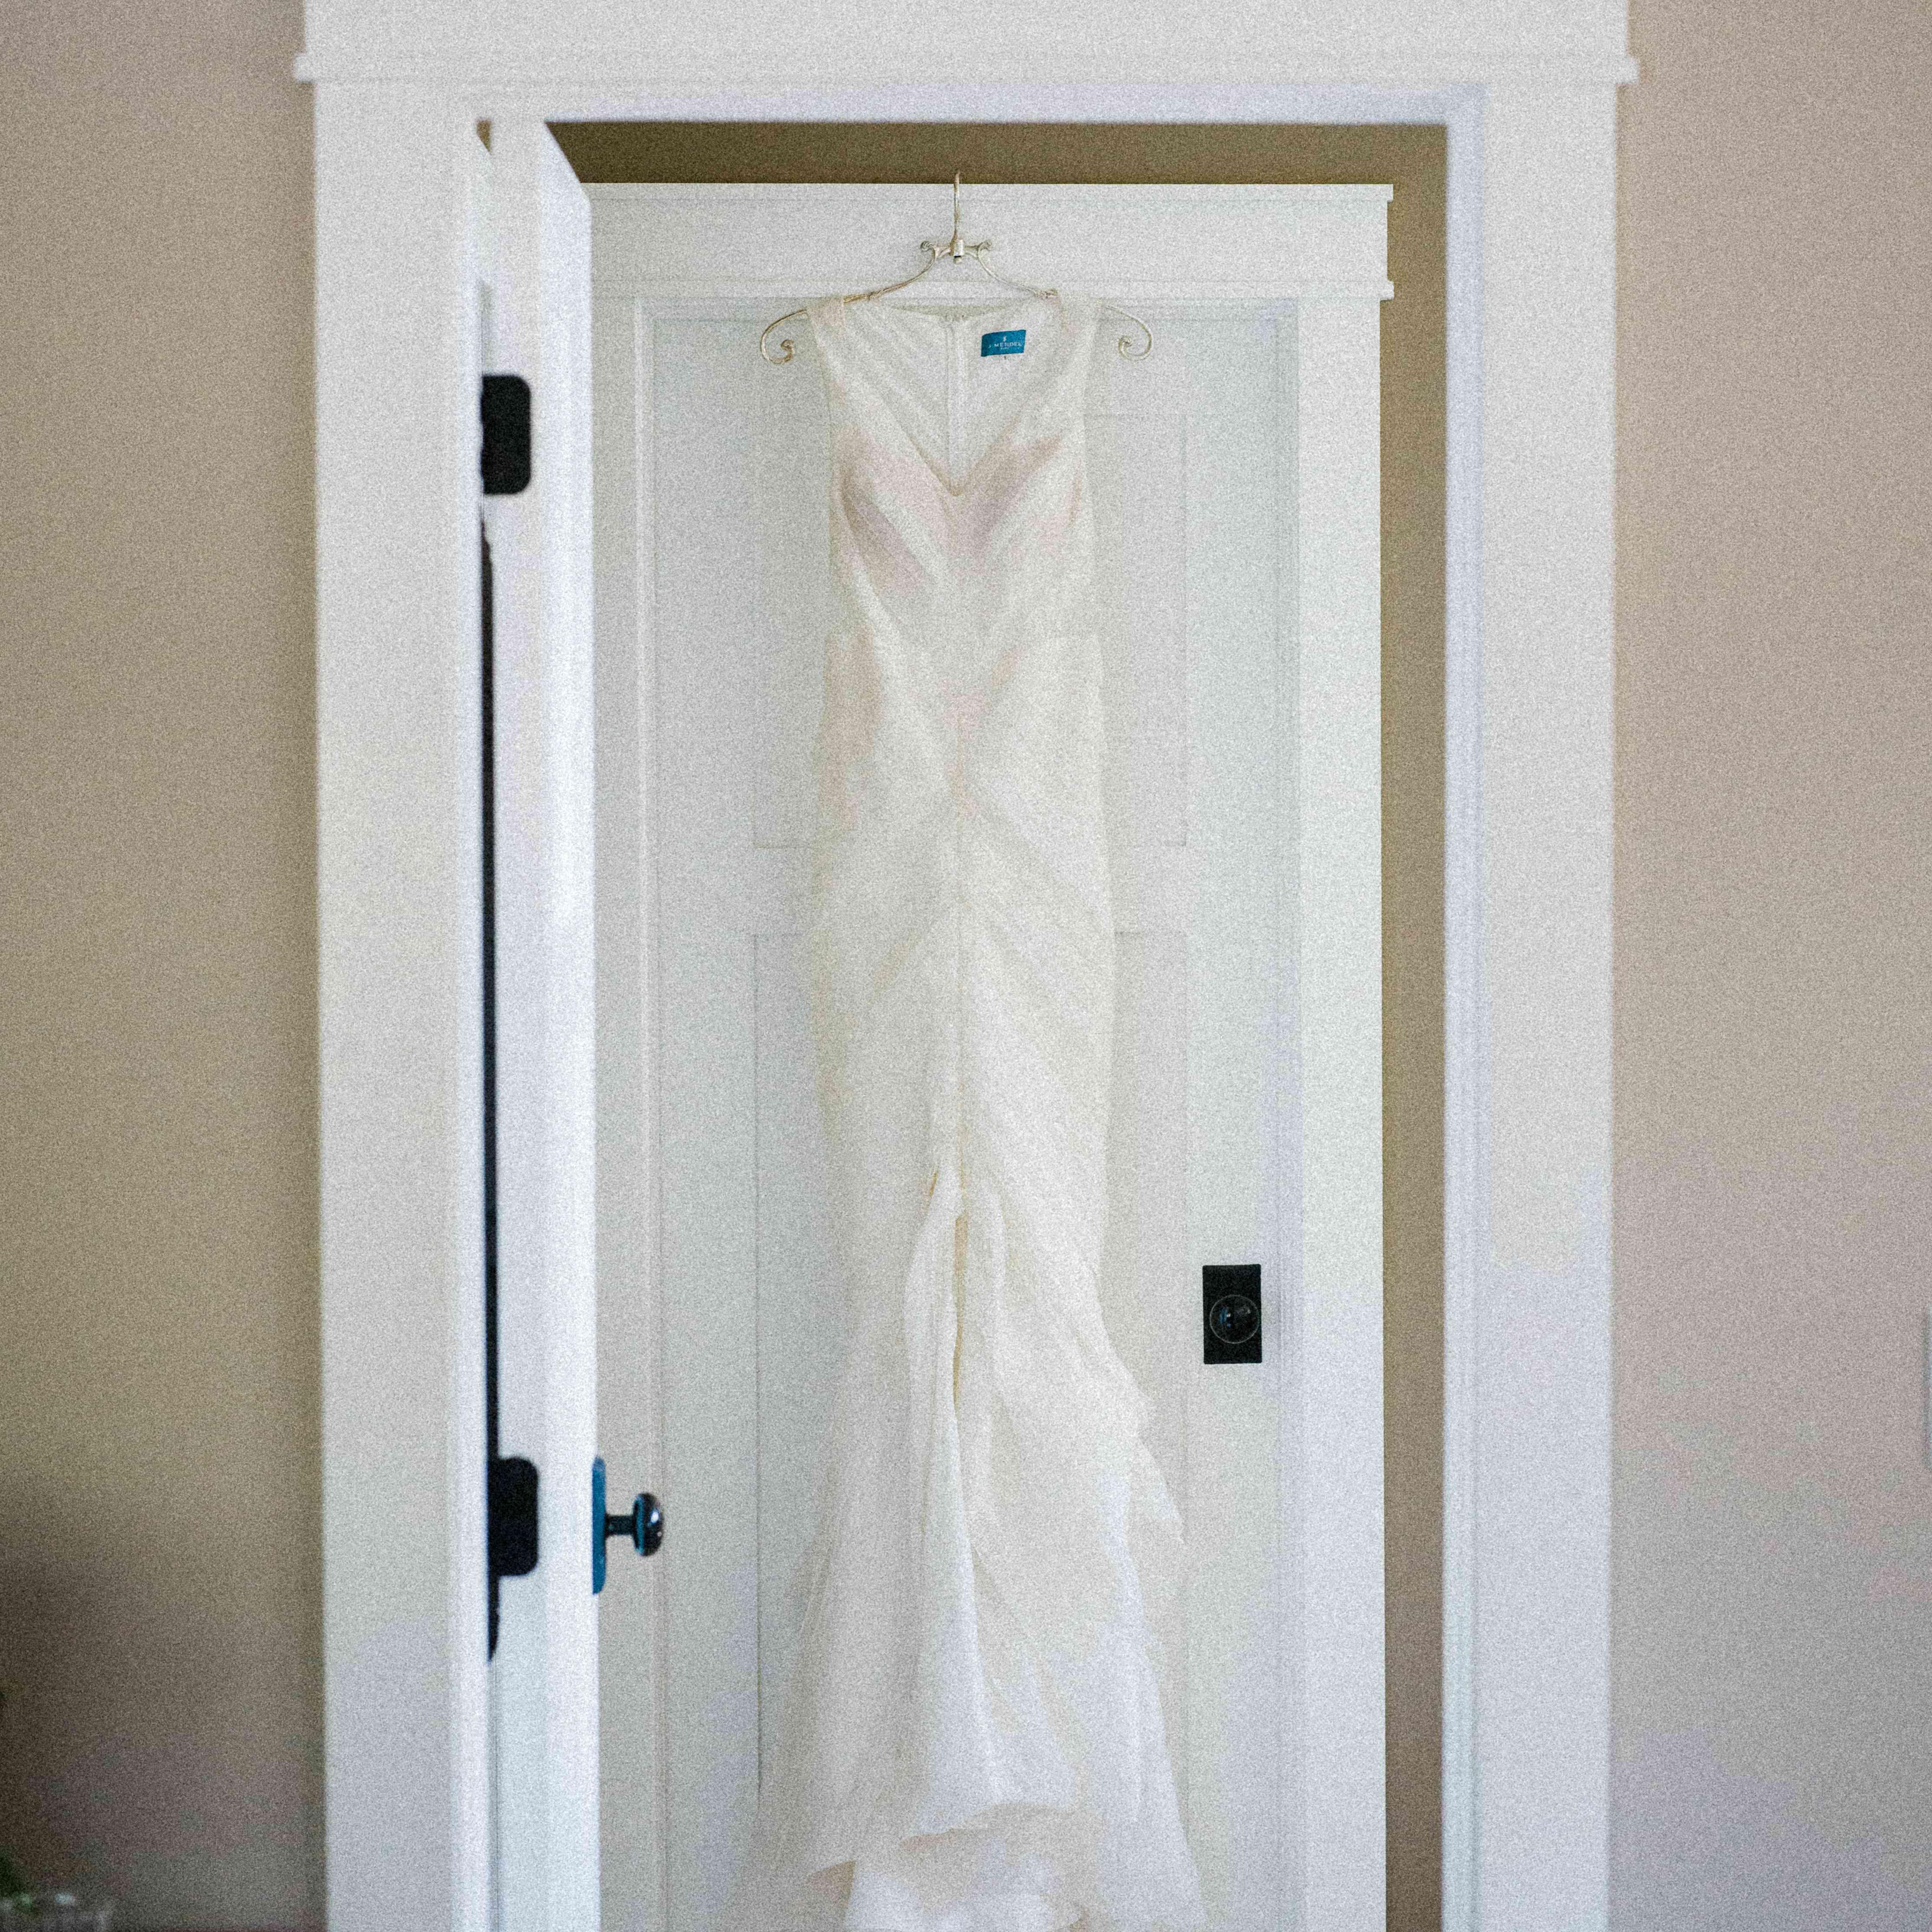 <p>Hanging wedding dress</p><br><br>